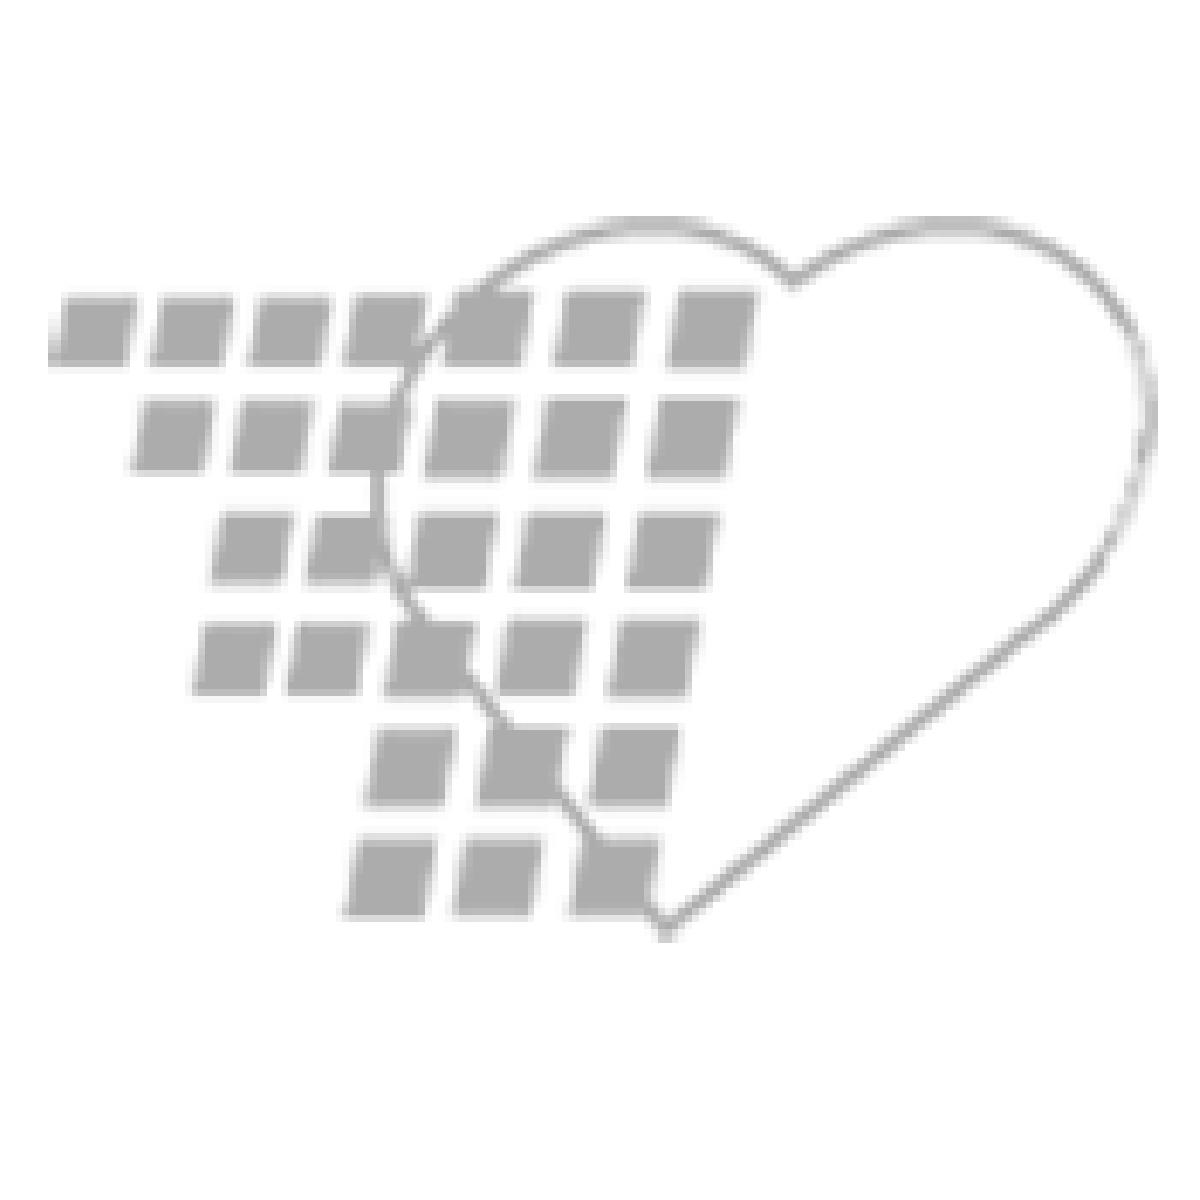 03-47-1032-LG - Latex Exam Gloves Singles - Small